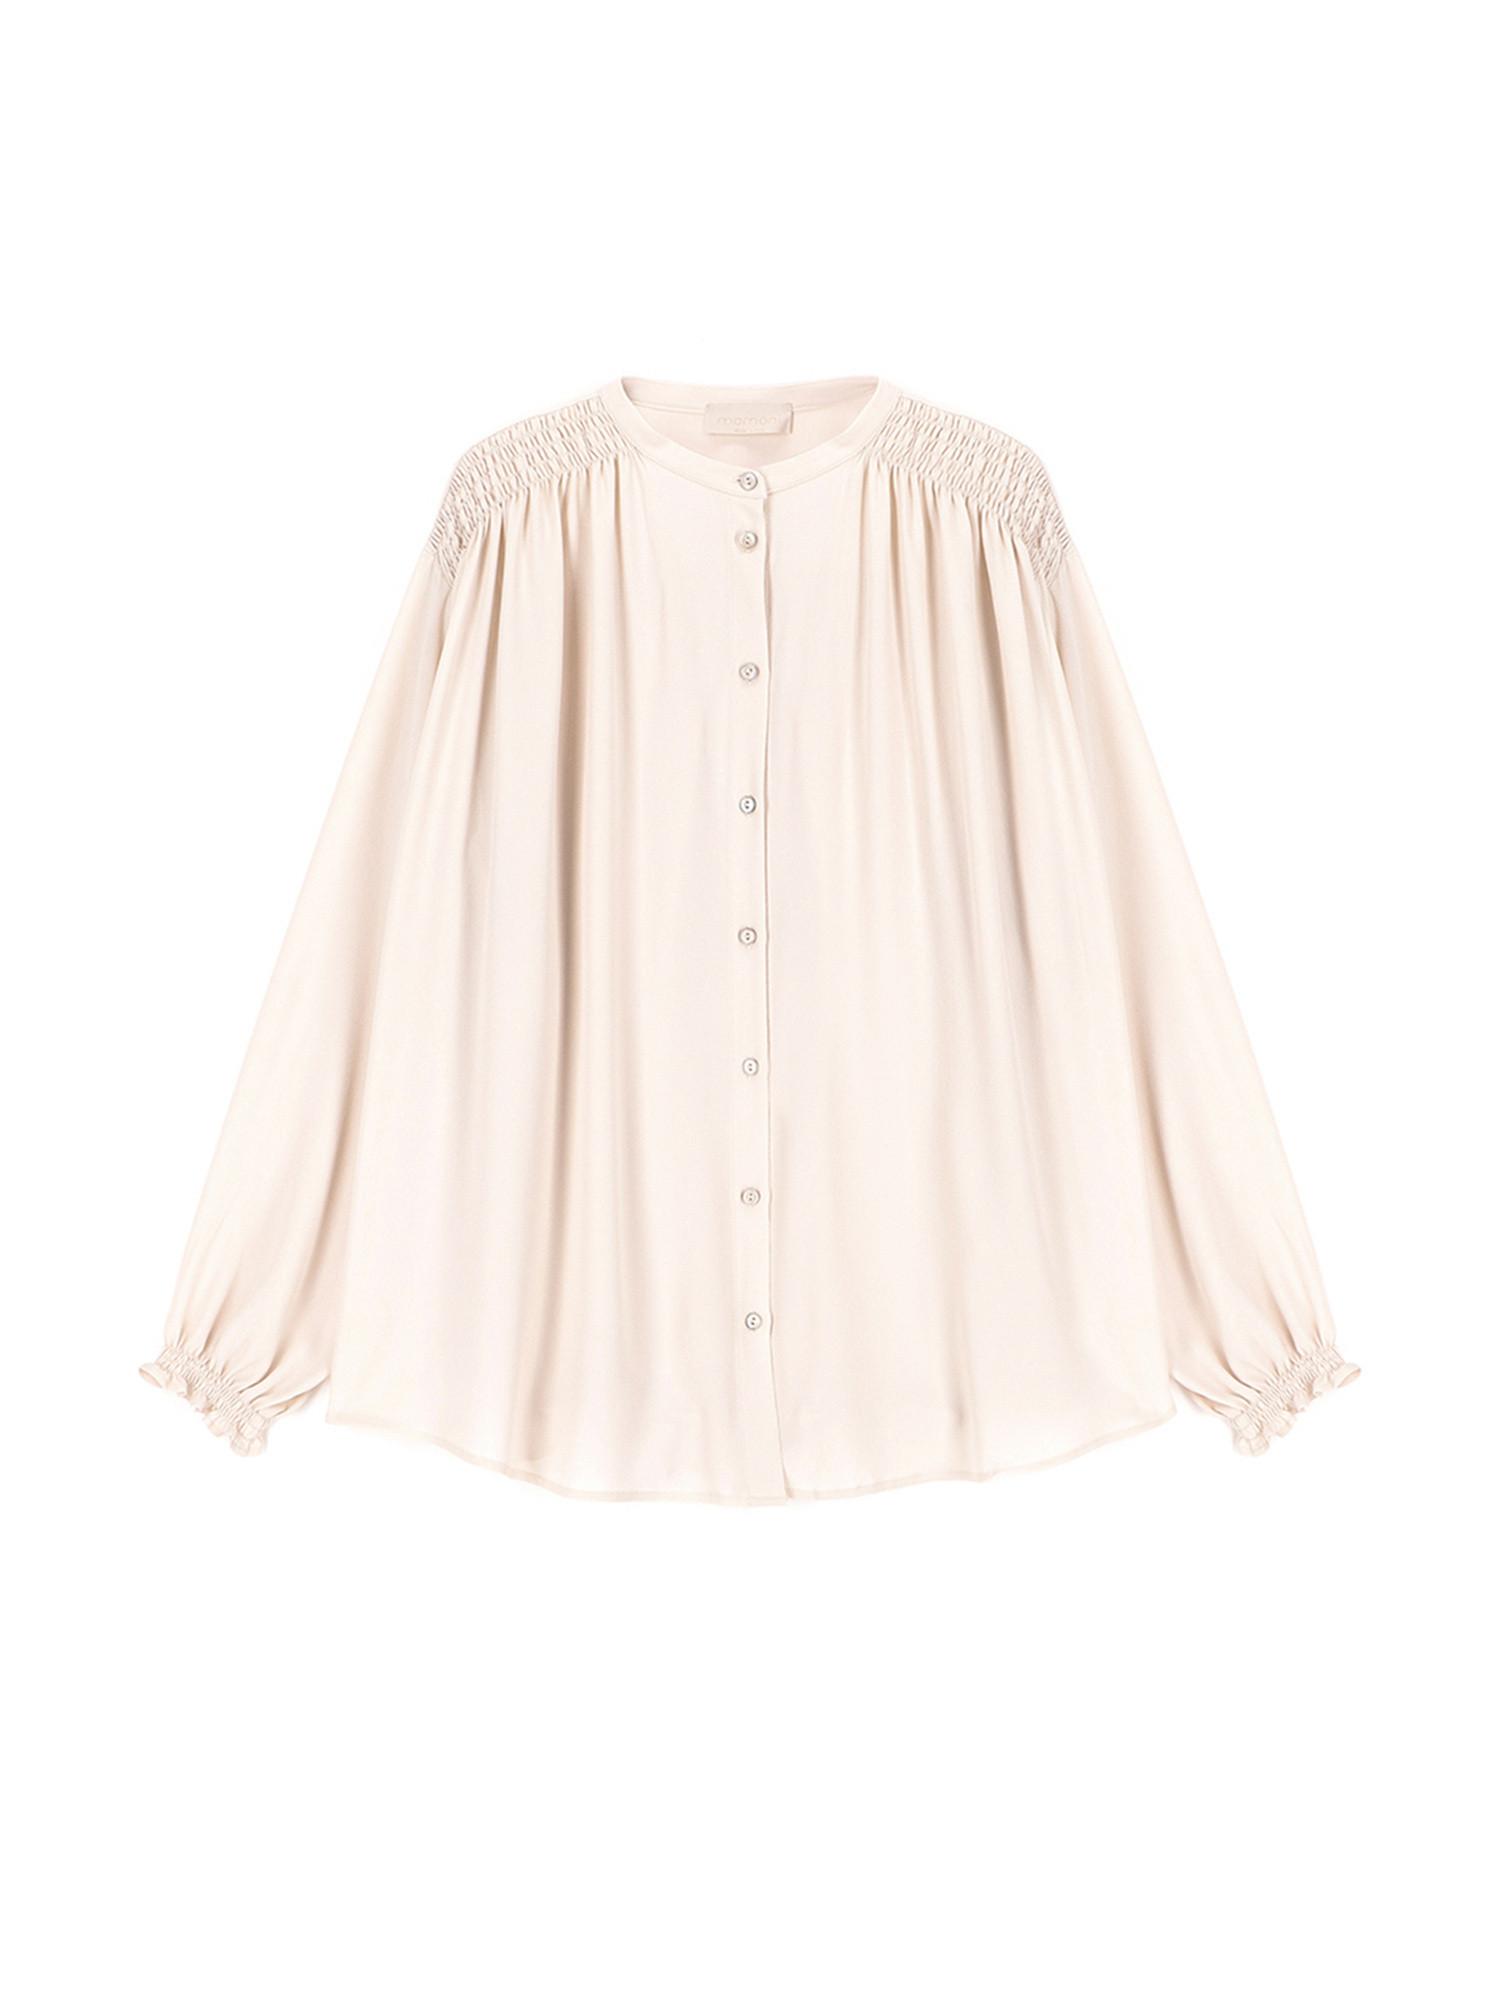 Camicia Firenze in tessuto misto seta, Bianco panna, large image number 0